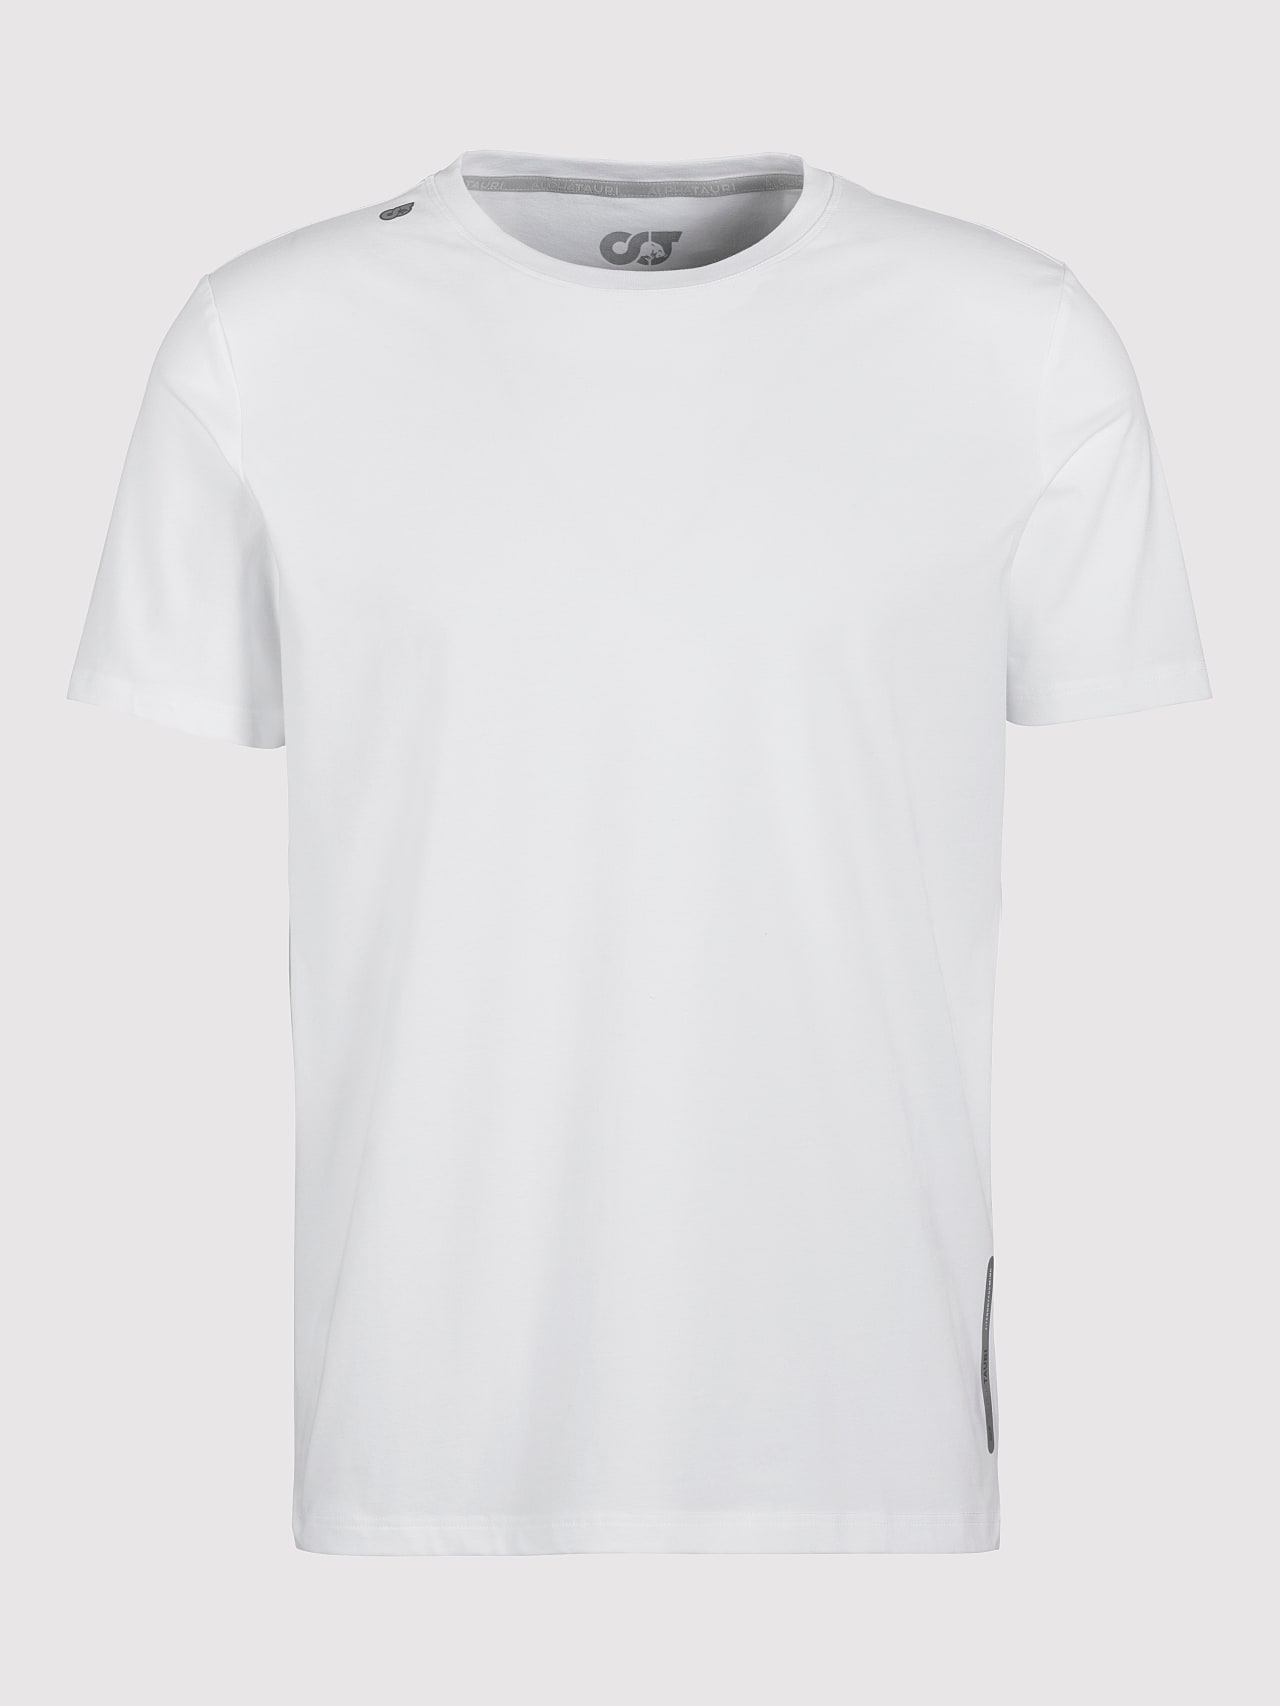 JALIP V1.Y5.01 Cotton Crew-Neck T-Shirt white Back Alpha Tauri